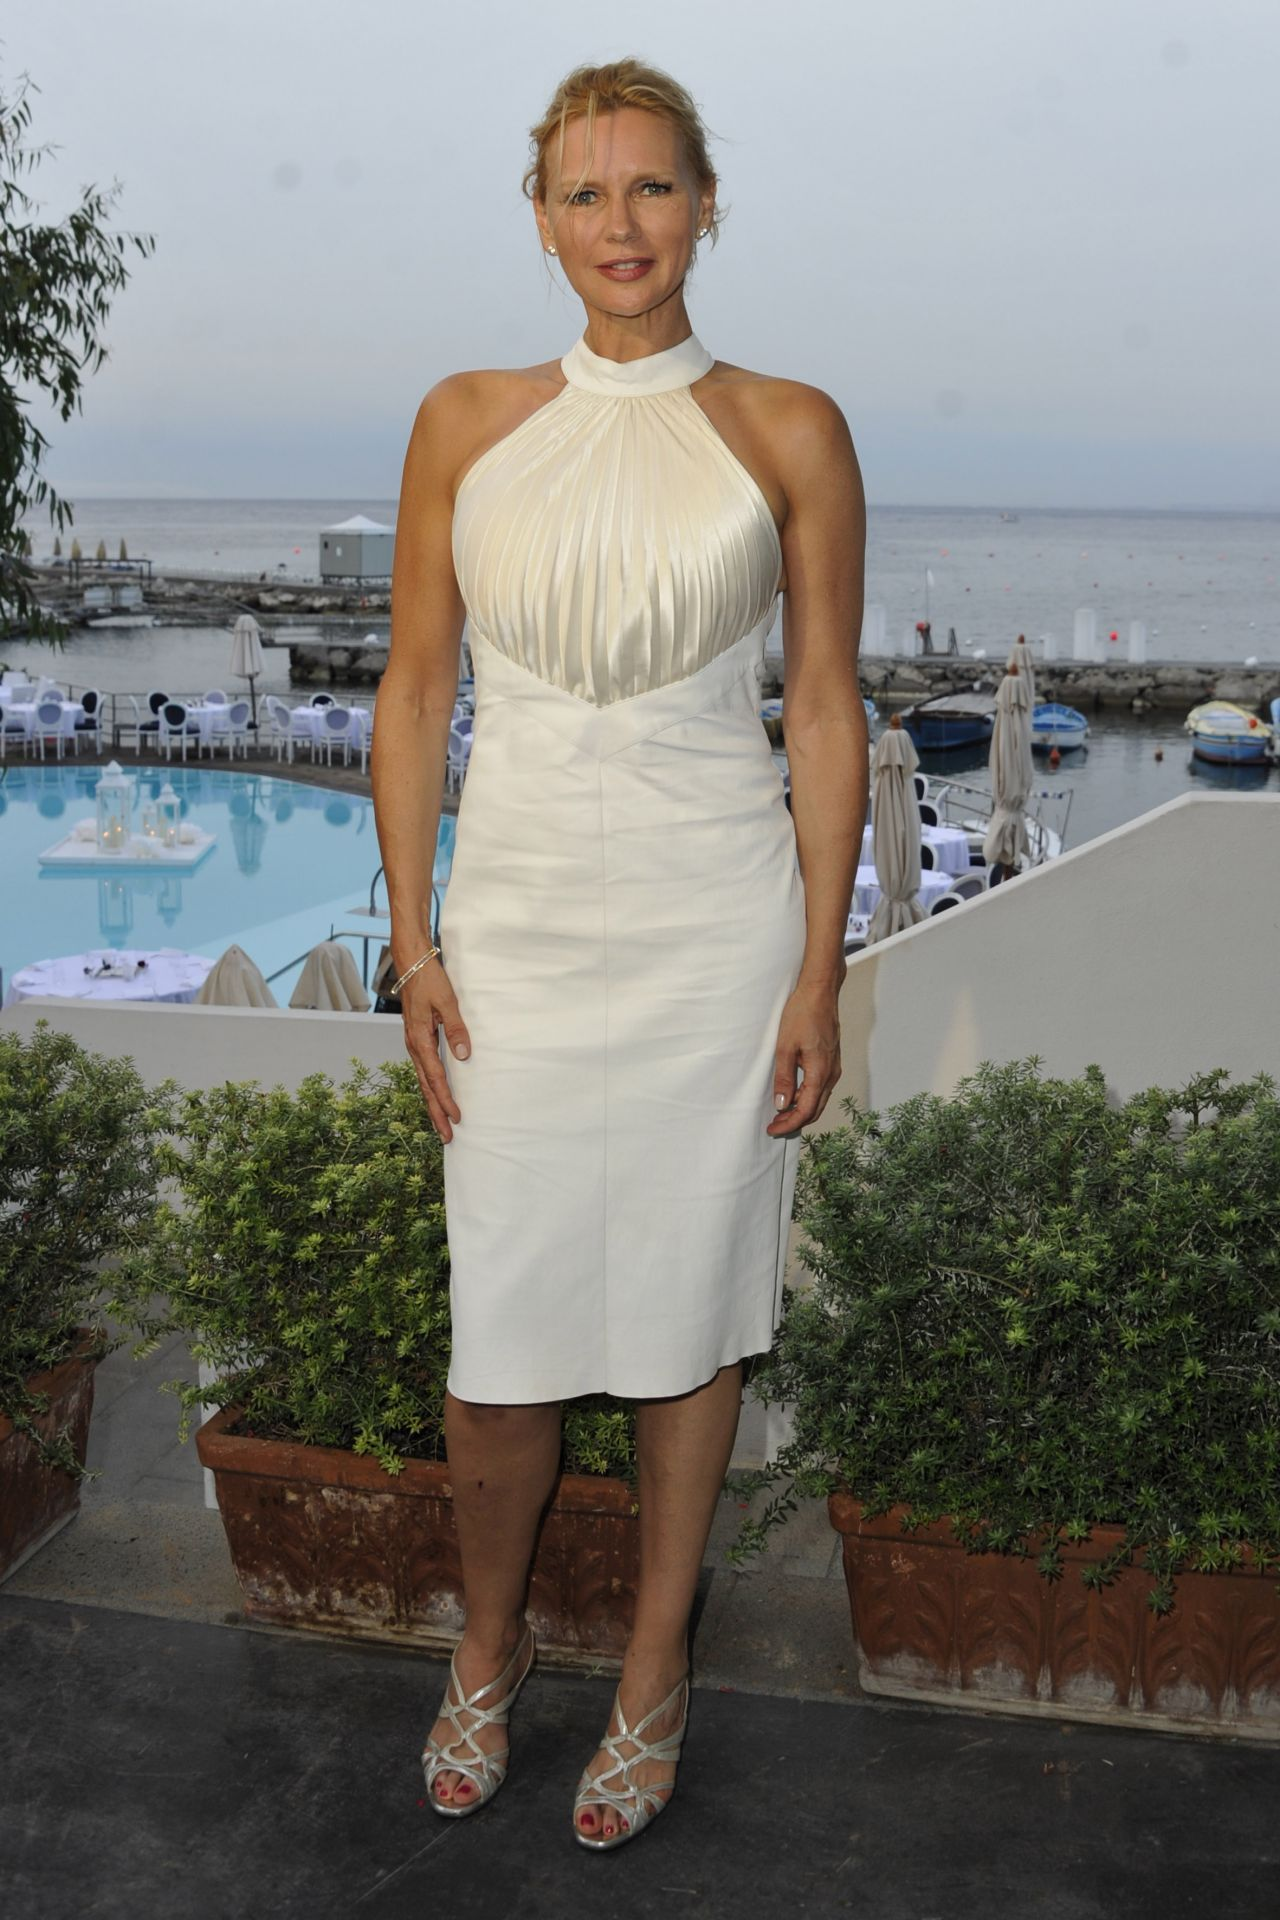 Veronica Ferres at TV SHOW in Ischia Global Festival 07/15 ...  Veronica Ferres...